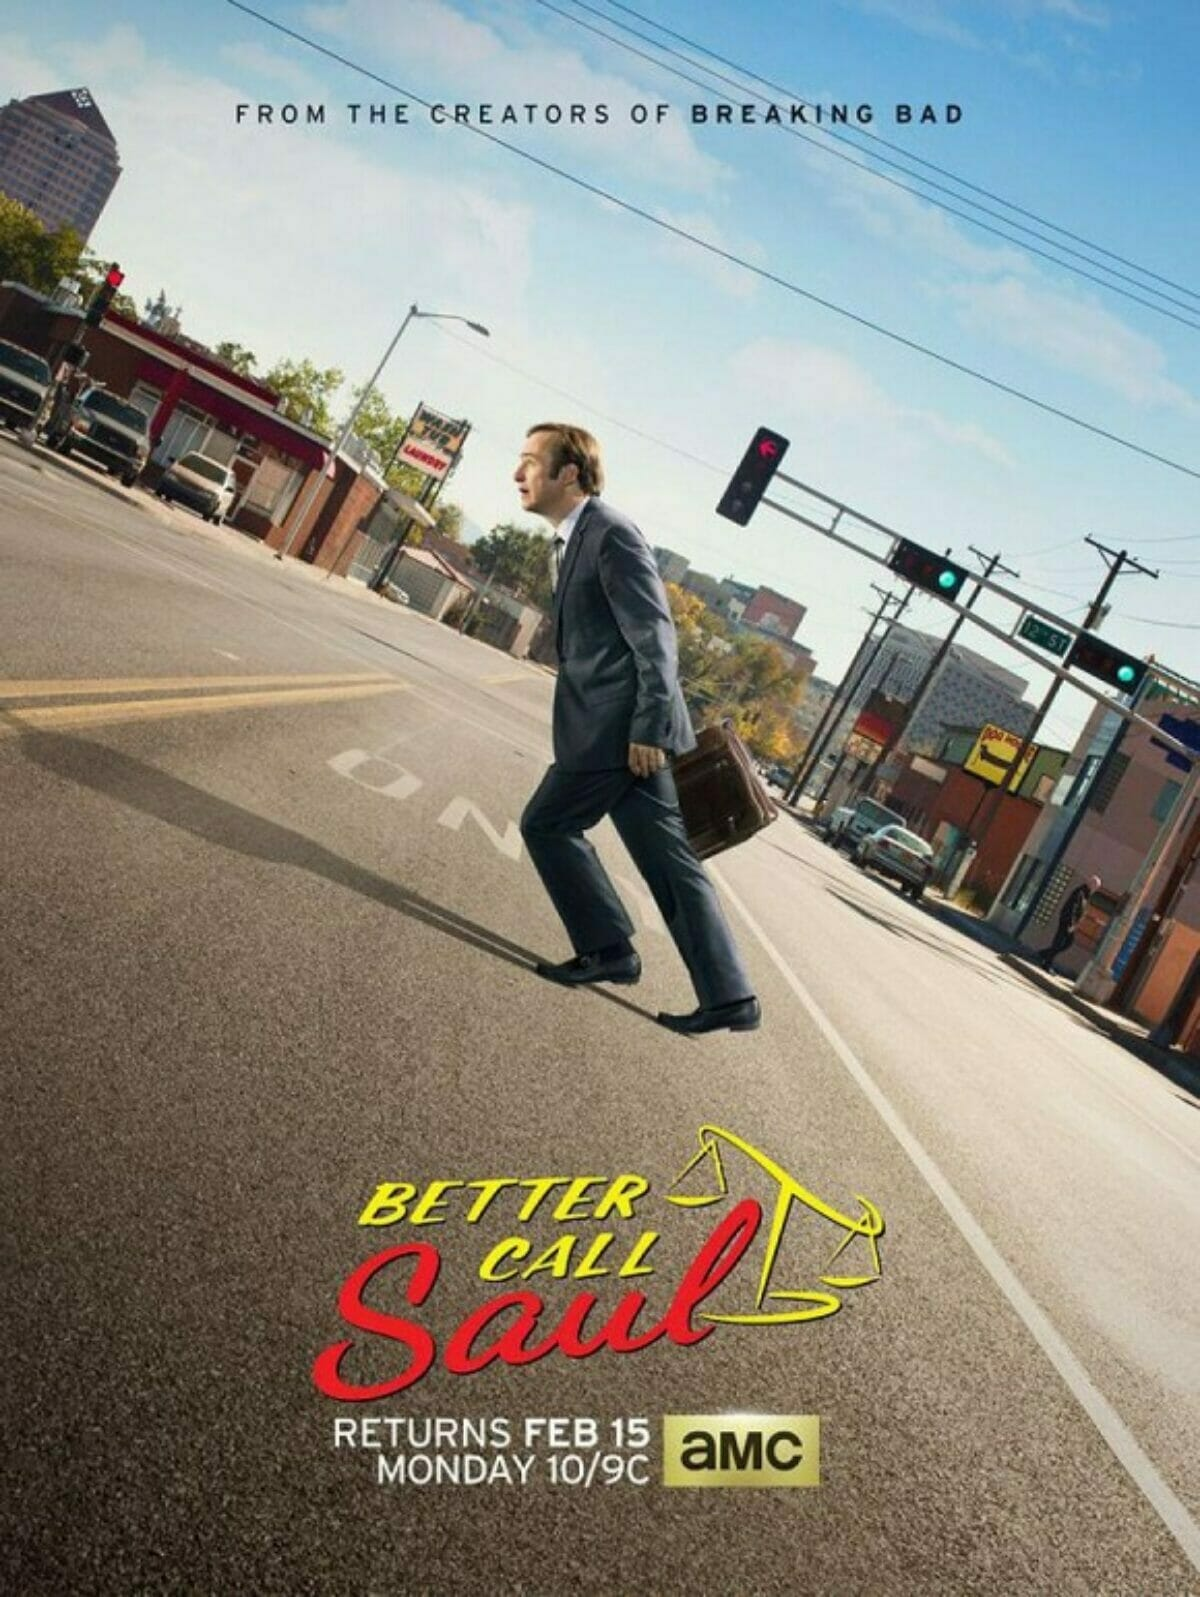 Better-Call-Saul-season2-poster